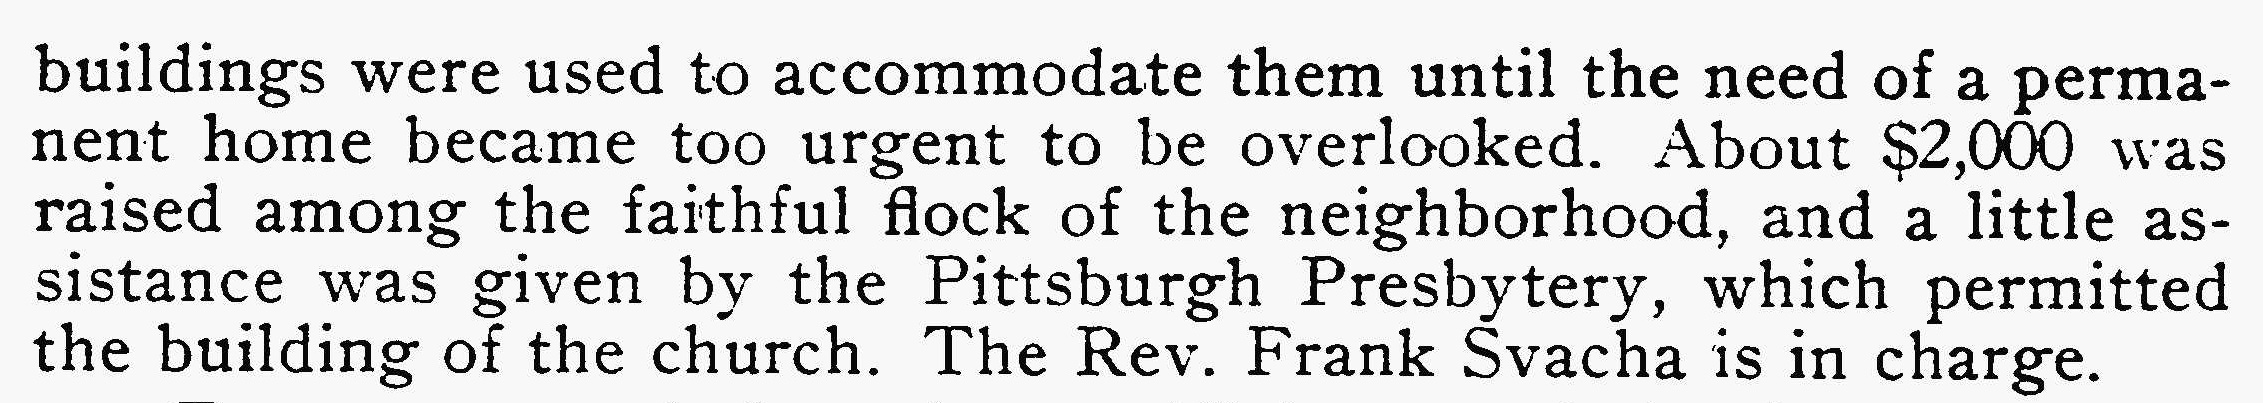 Second Presbyterian Church - Edward S Maurey - Where the West Began (pg65).jpg